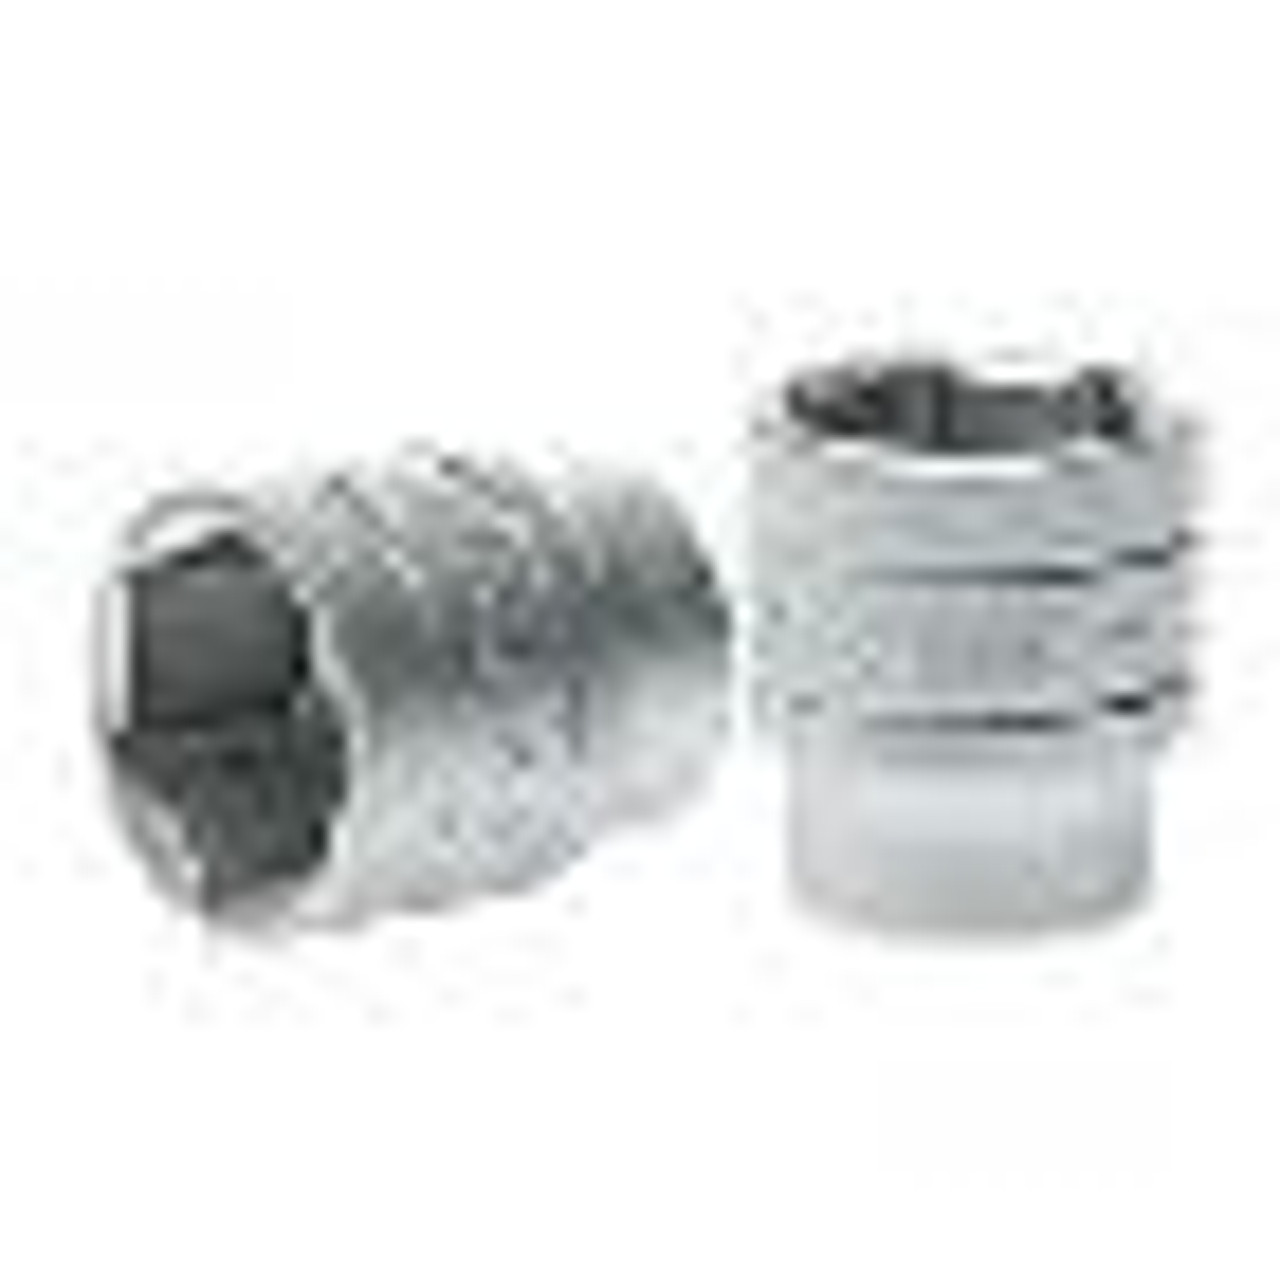 "M380519-C Teng 19mm 3/8"" Drive standard Socket"